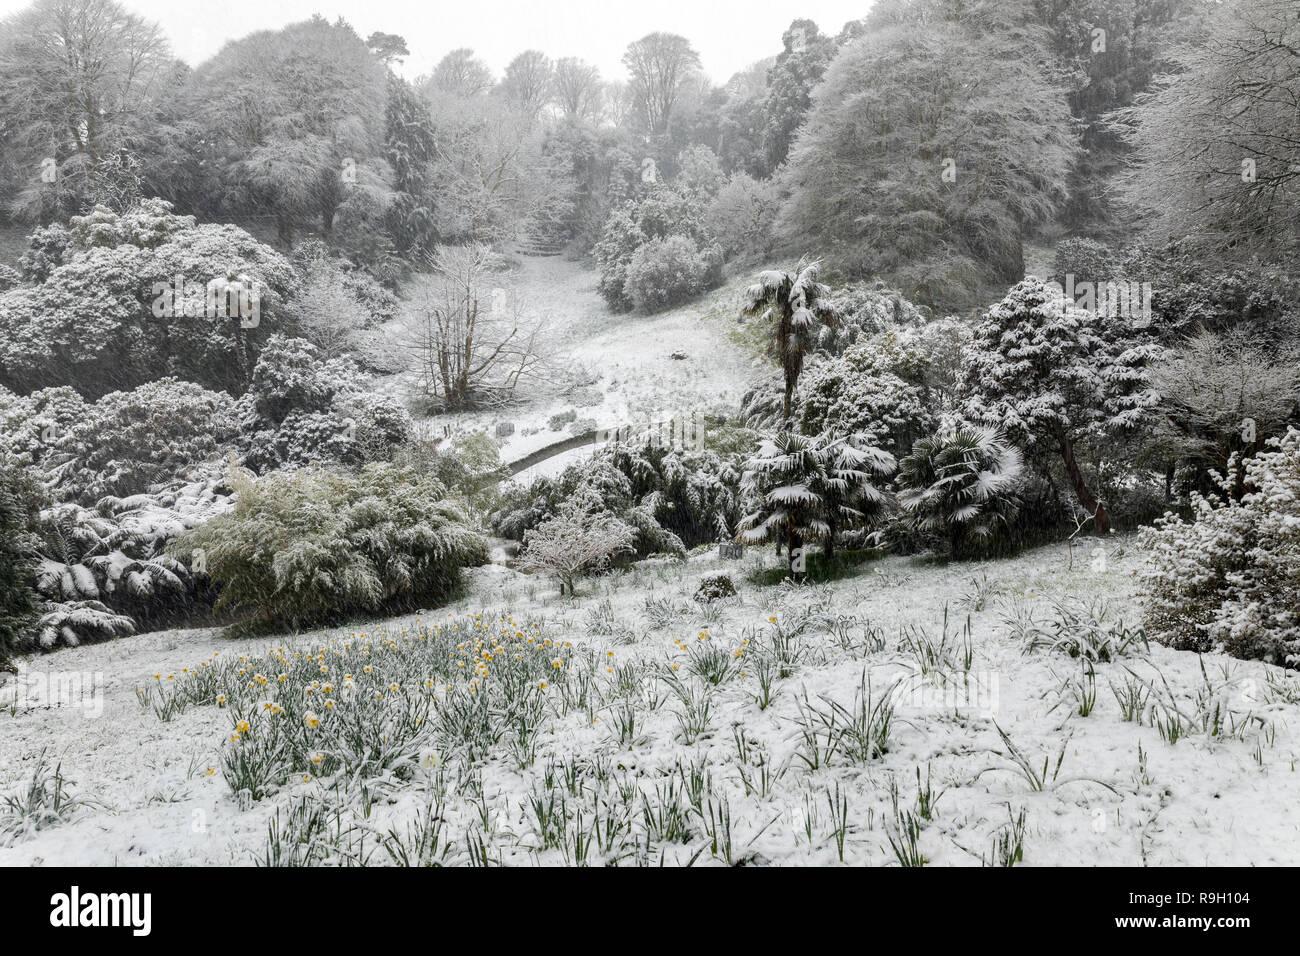 Trebah Garden; Snowing; Cornwall; UK - Stock Image